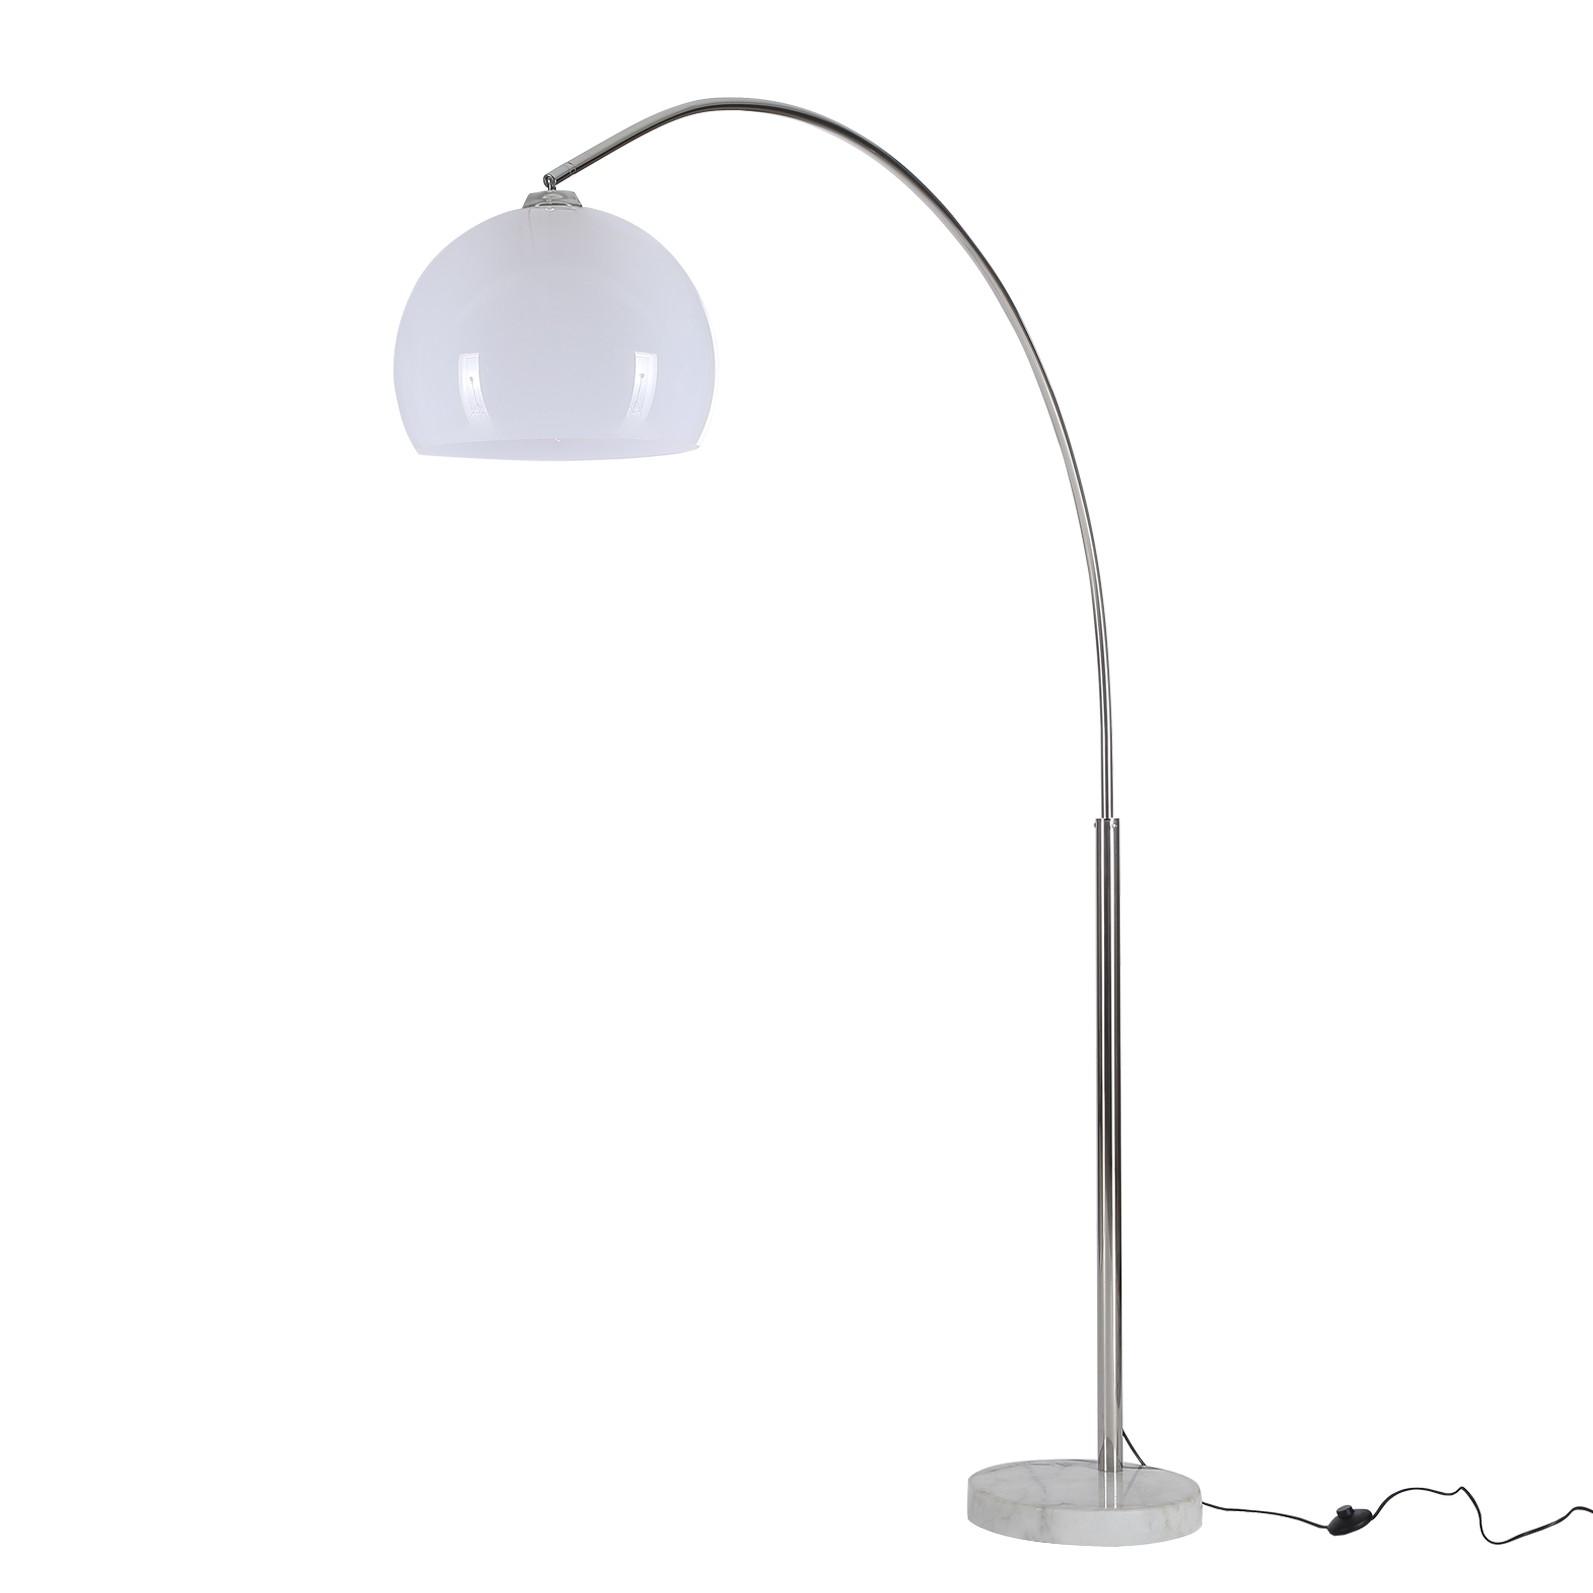 bogenleuchte helsinki metall marmor 1 flammig loistaa a g nstig online kaufen. Black Bedroom Furniture Sets. Home Design Ideas